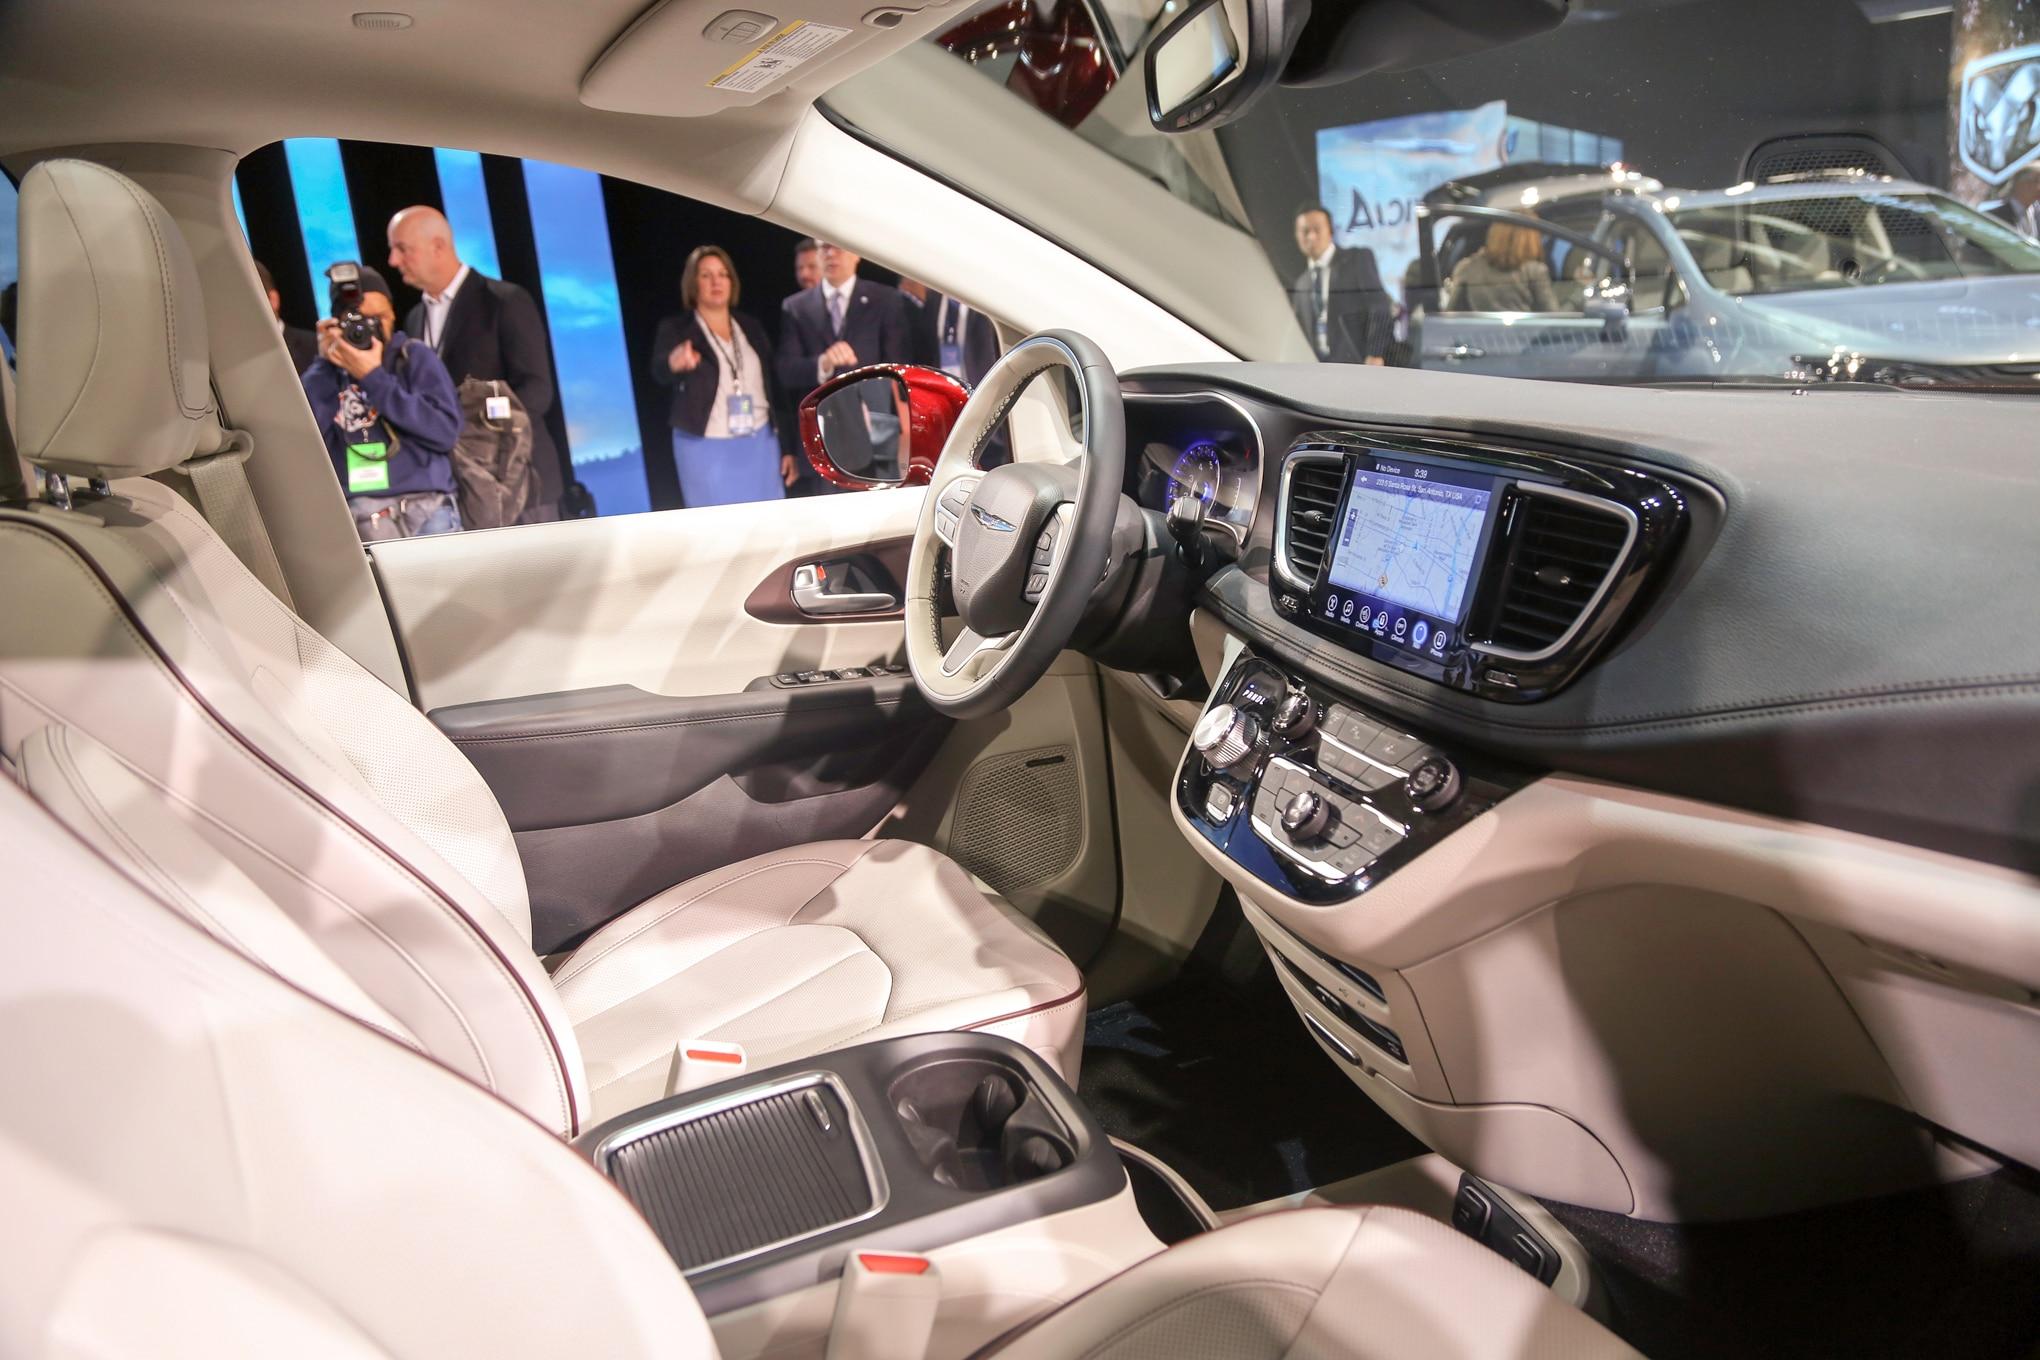 2017 chrysler interior gallery for Chrysler pacifica 2017 interior